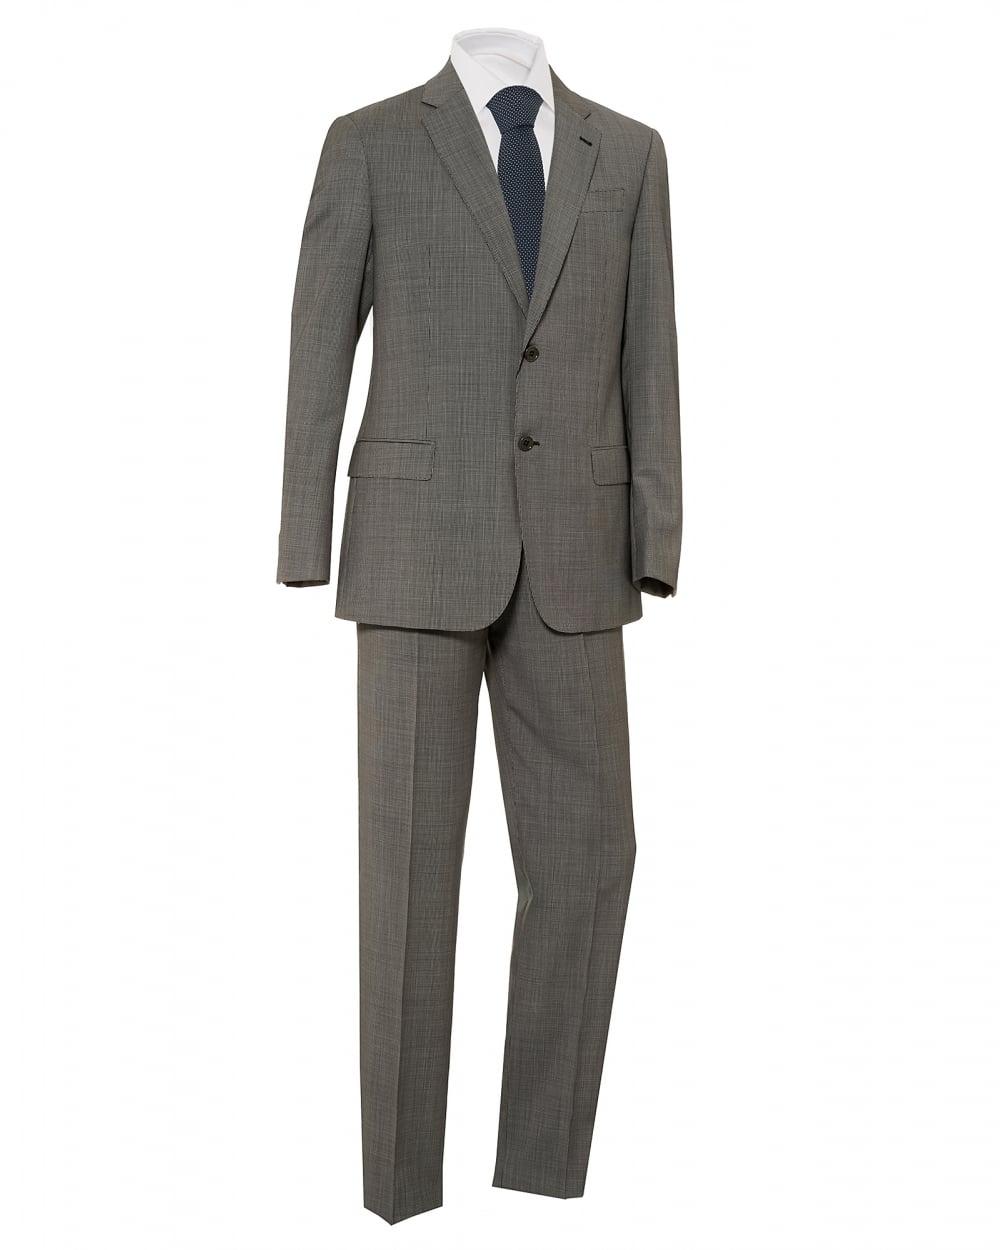 ff1a9a202d9 Emporio Armani Mens Micro Check 2 Button Wool Grey Suit